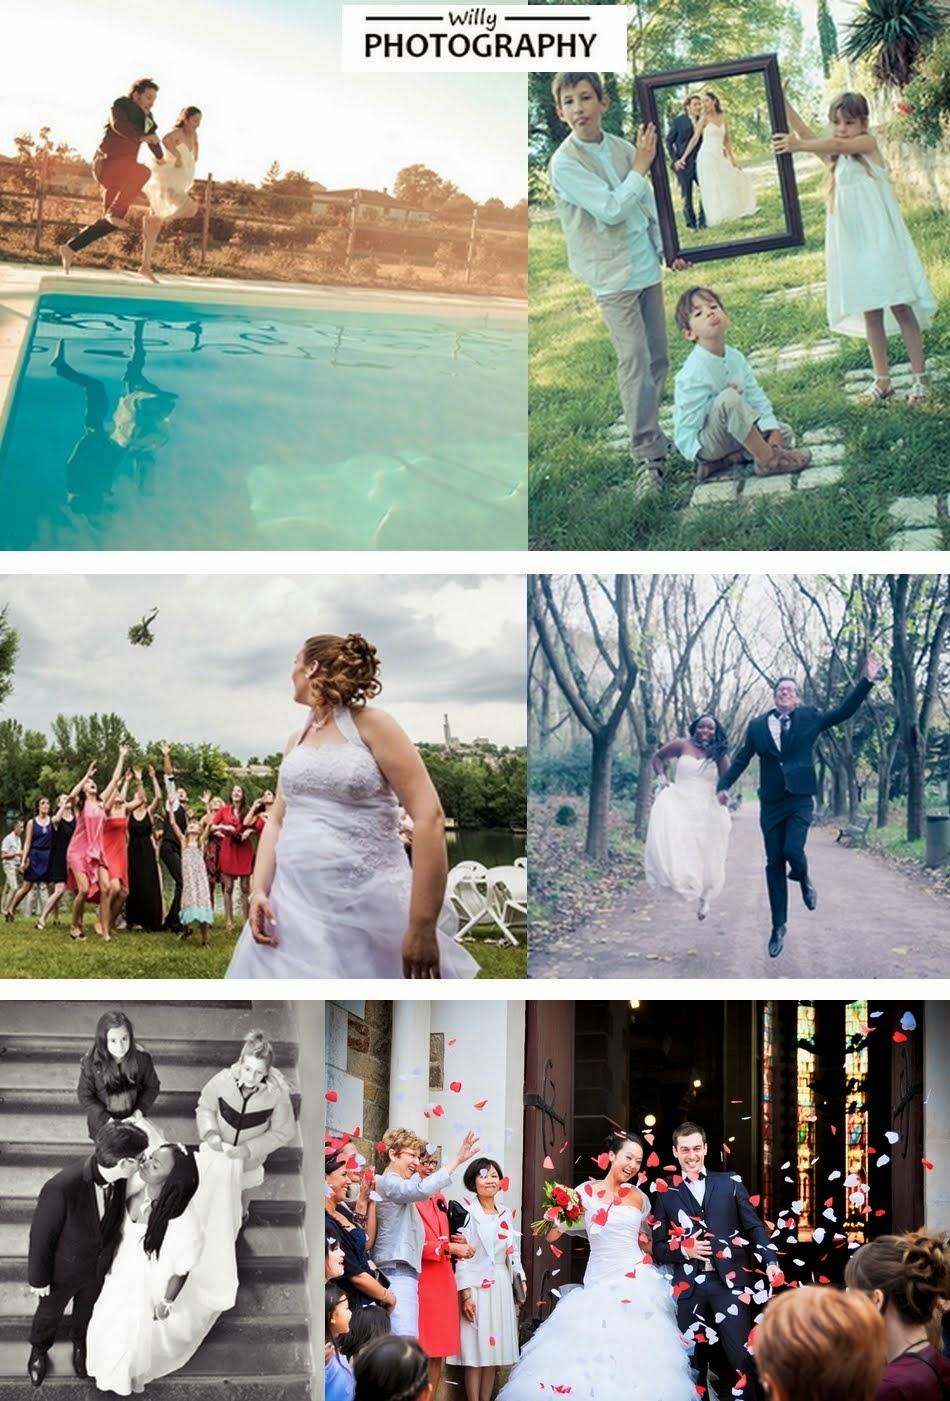 photographe mariage Toulouse, Albi, Bordeaux, Montpellier